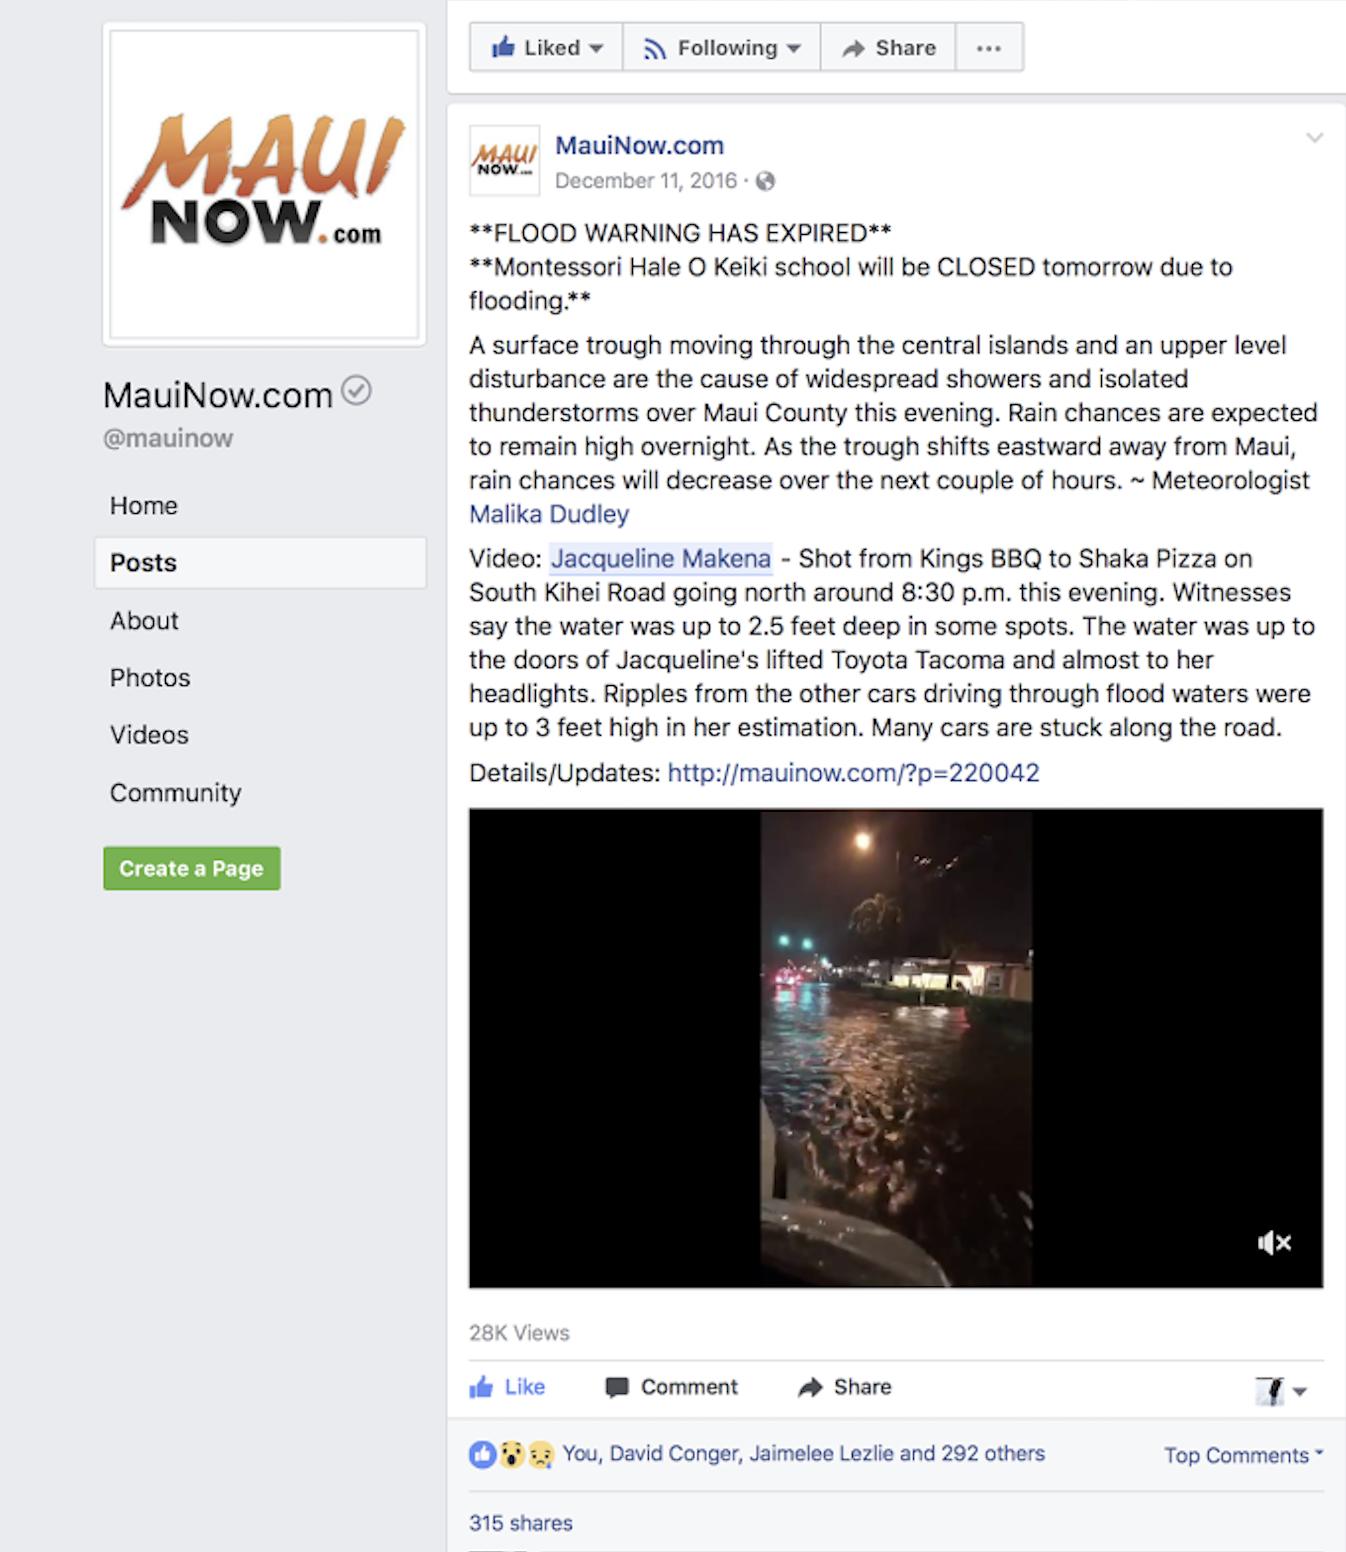 MauiNow 4